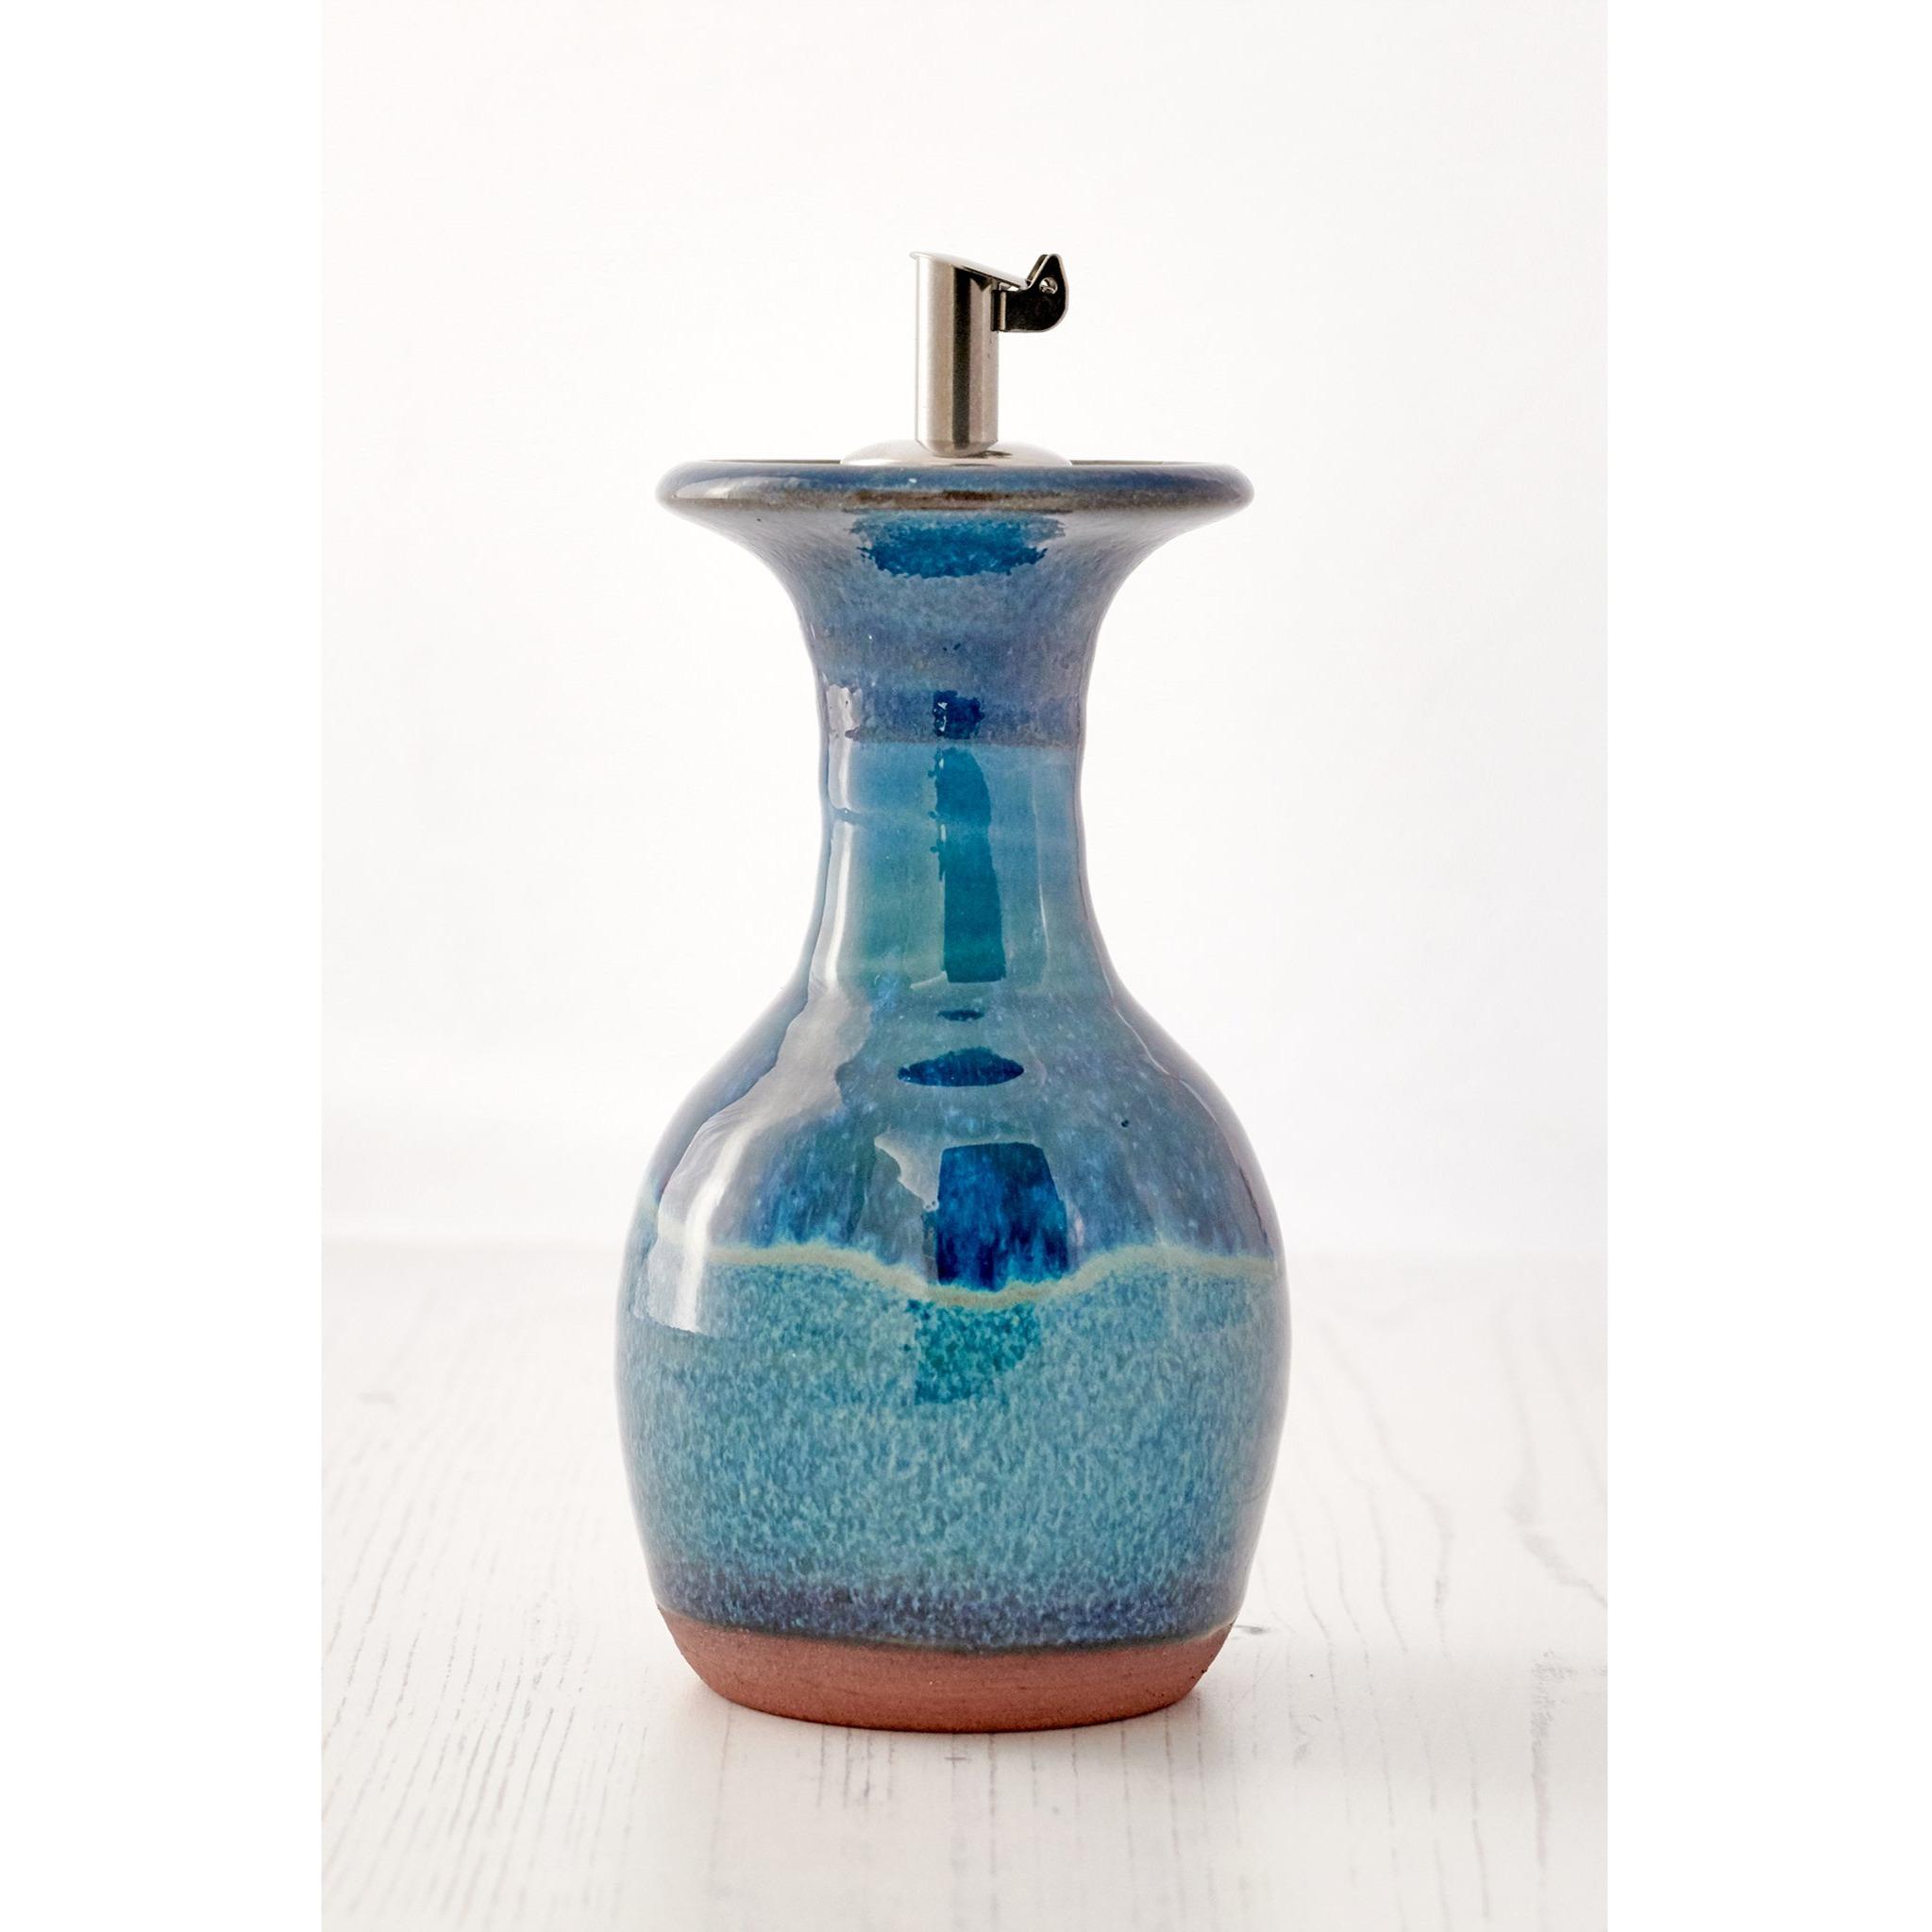 Aqua Marine Oil Decanter by Rupert Blamire